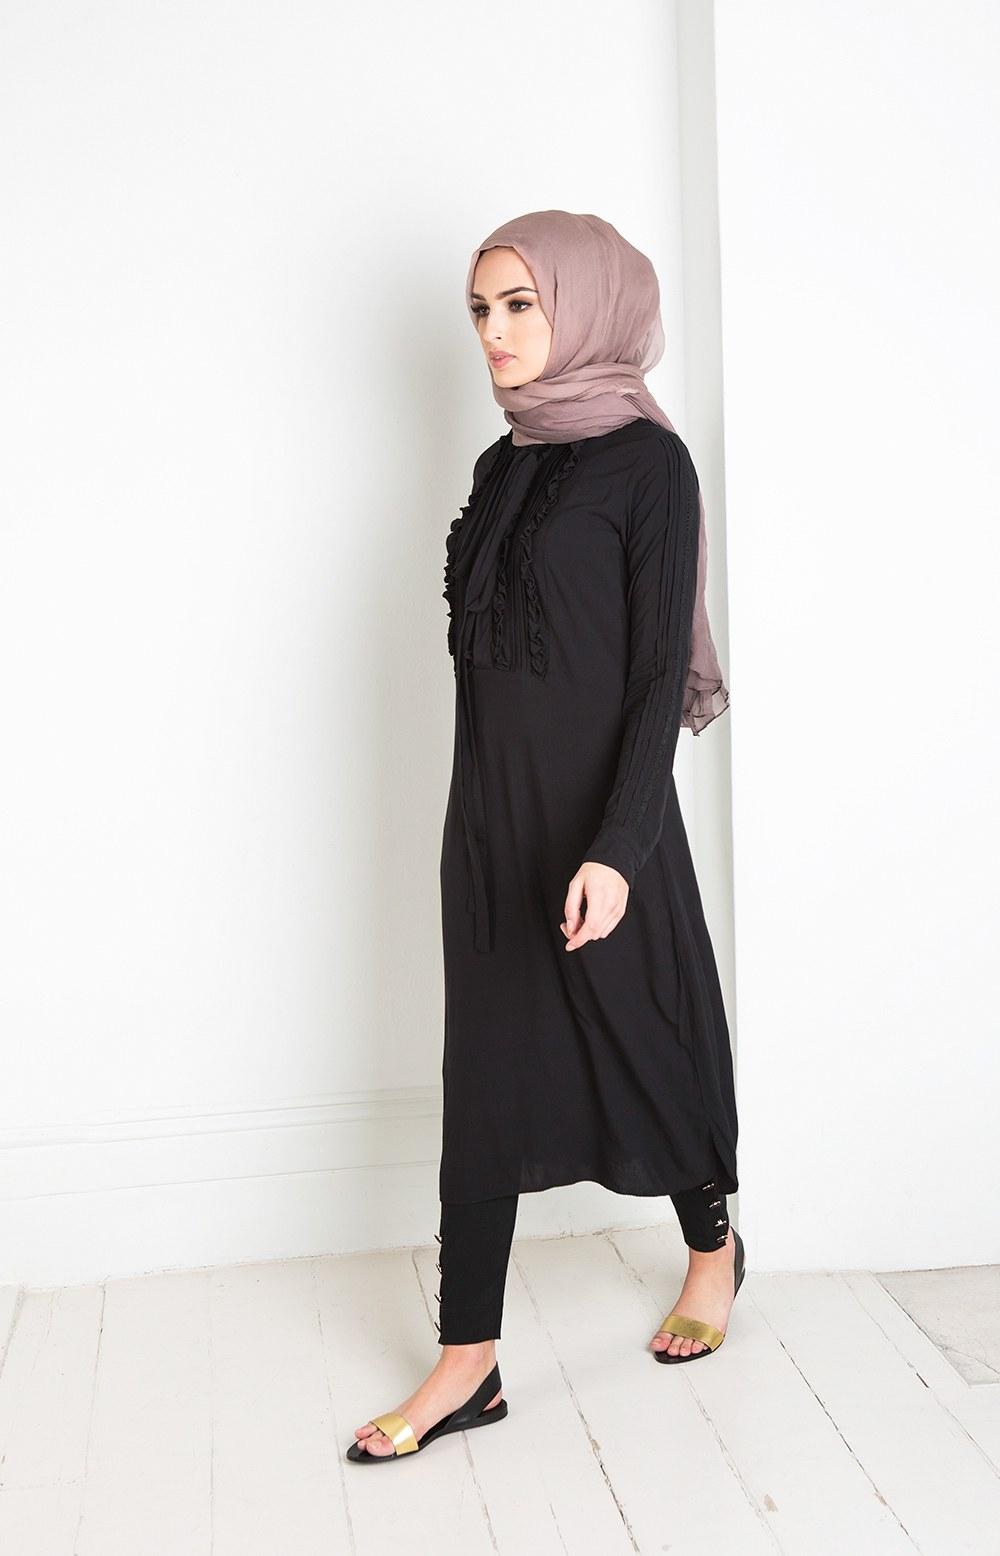 Design Model Baju Lebaran Simple 0gdr 25 Trend Model Baju Muslim Lebaran 2018 Simple & Modis